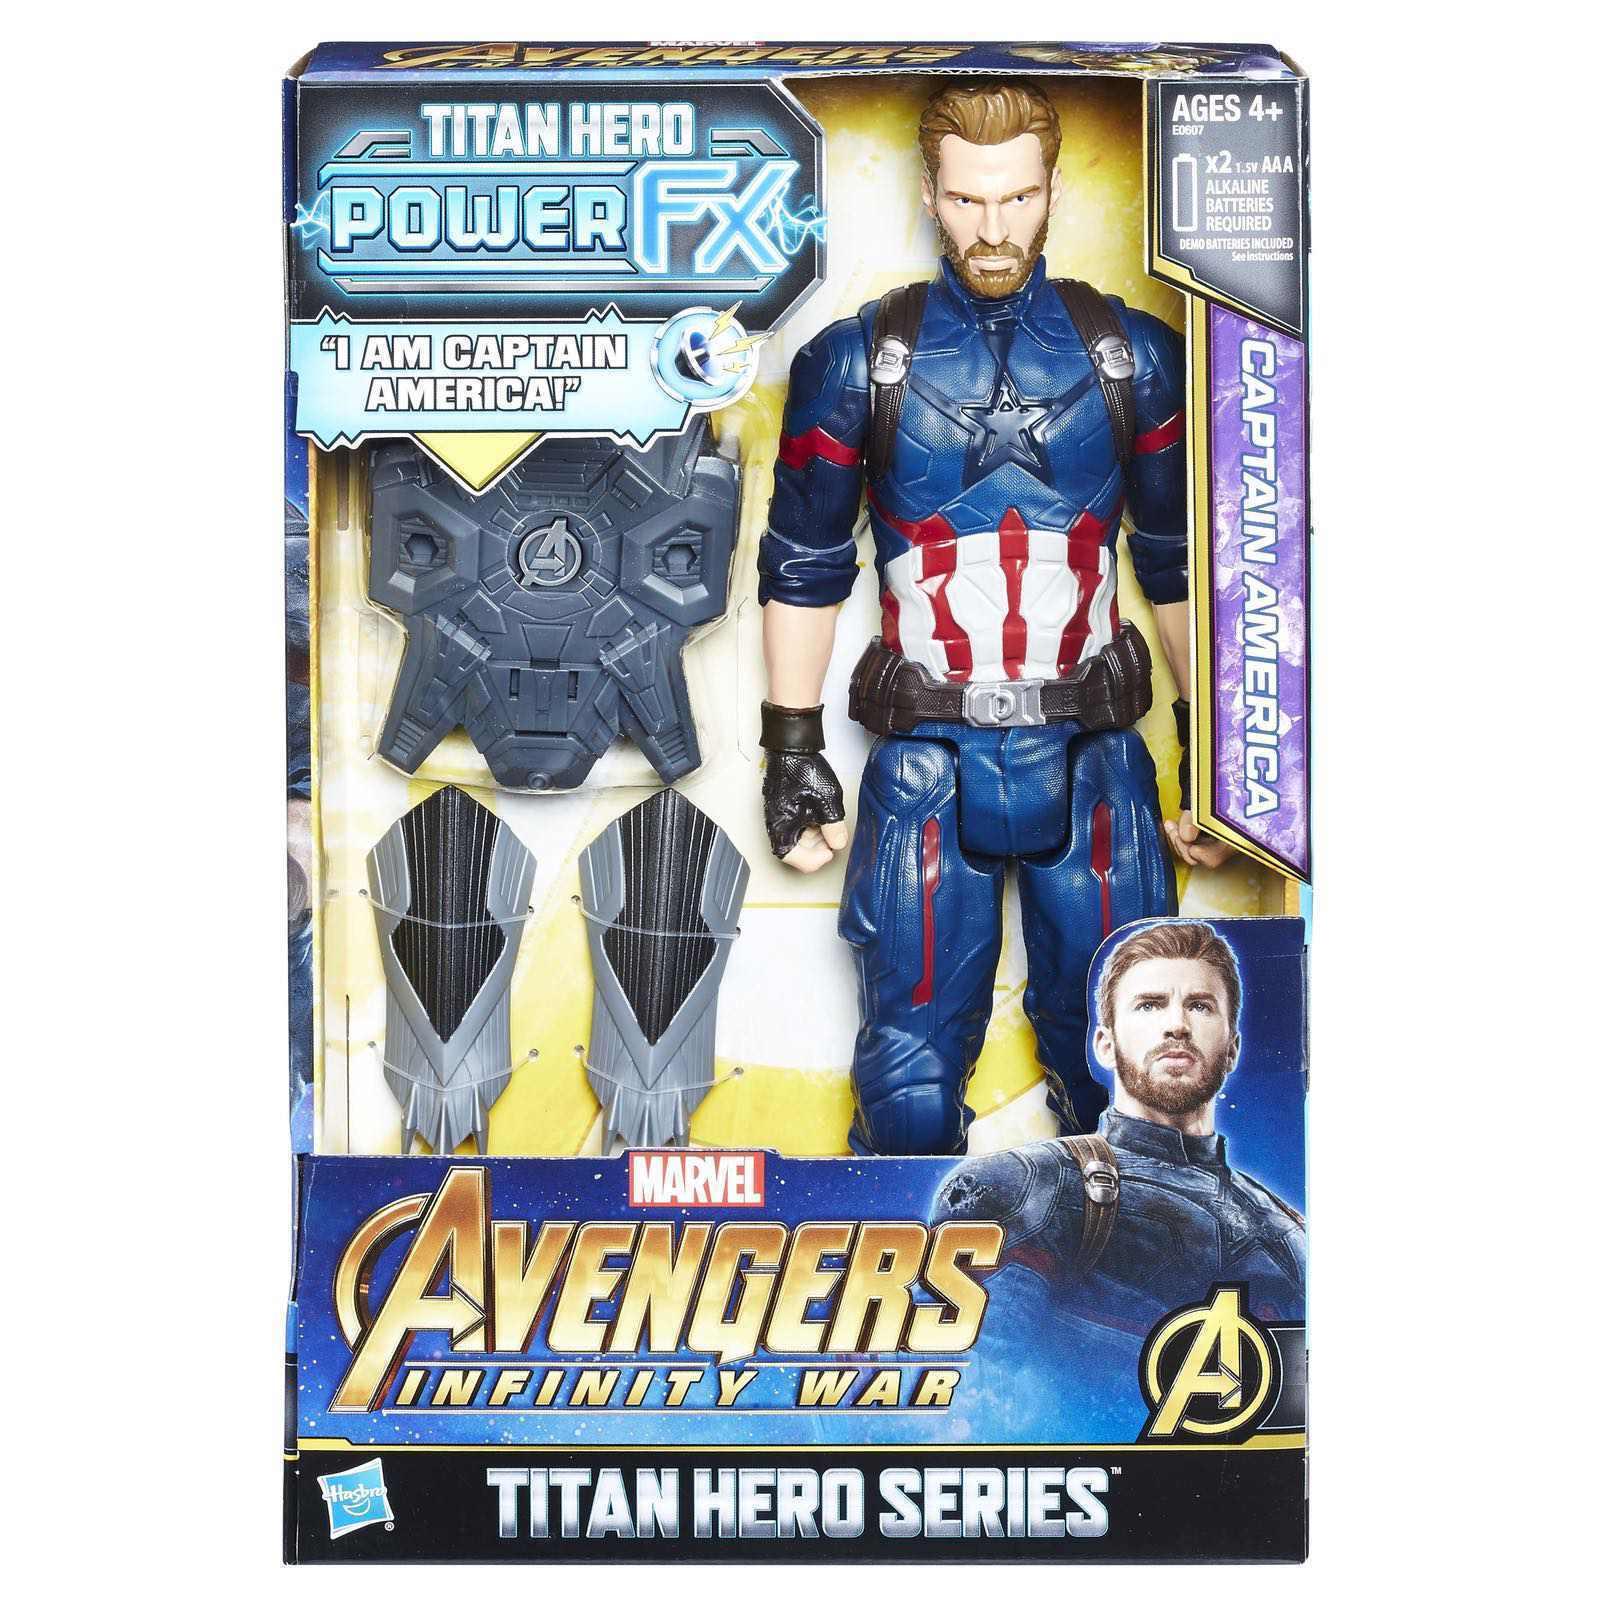 Hasbro marvel avengers 2 infinity krieg.